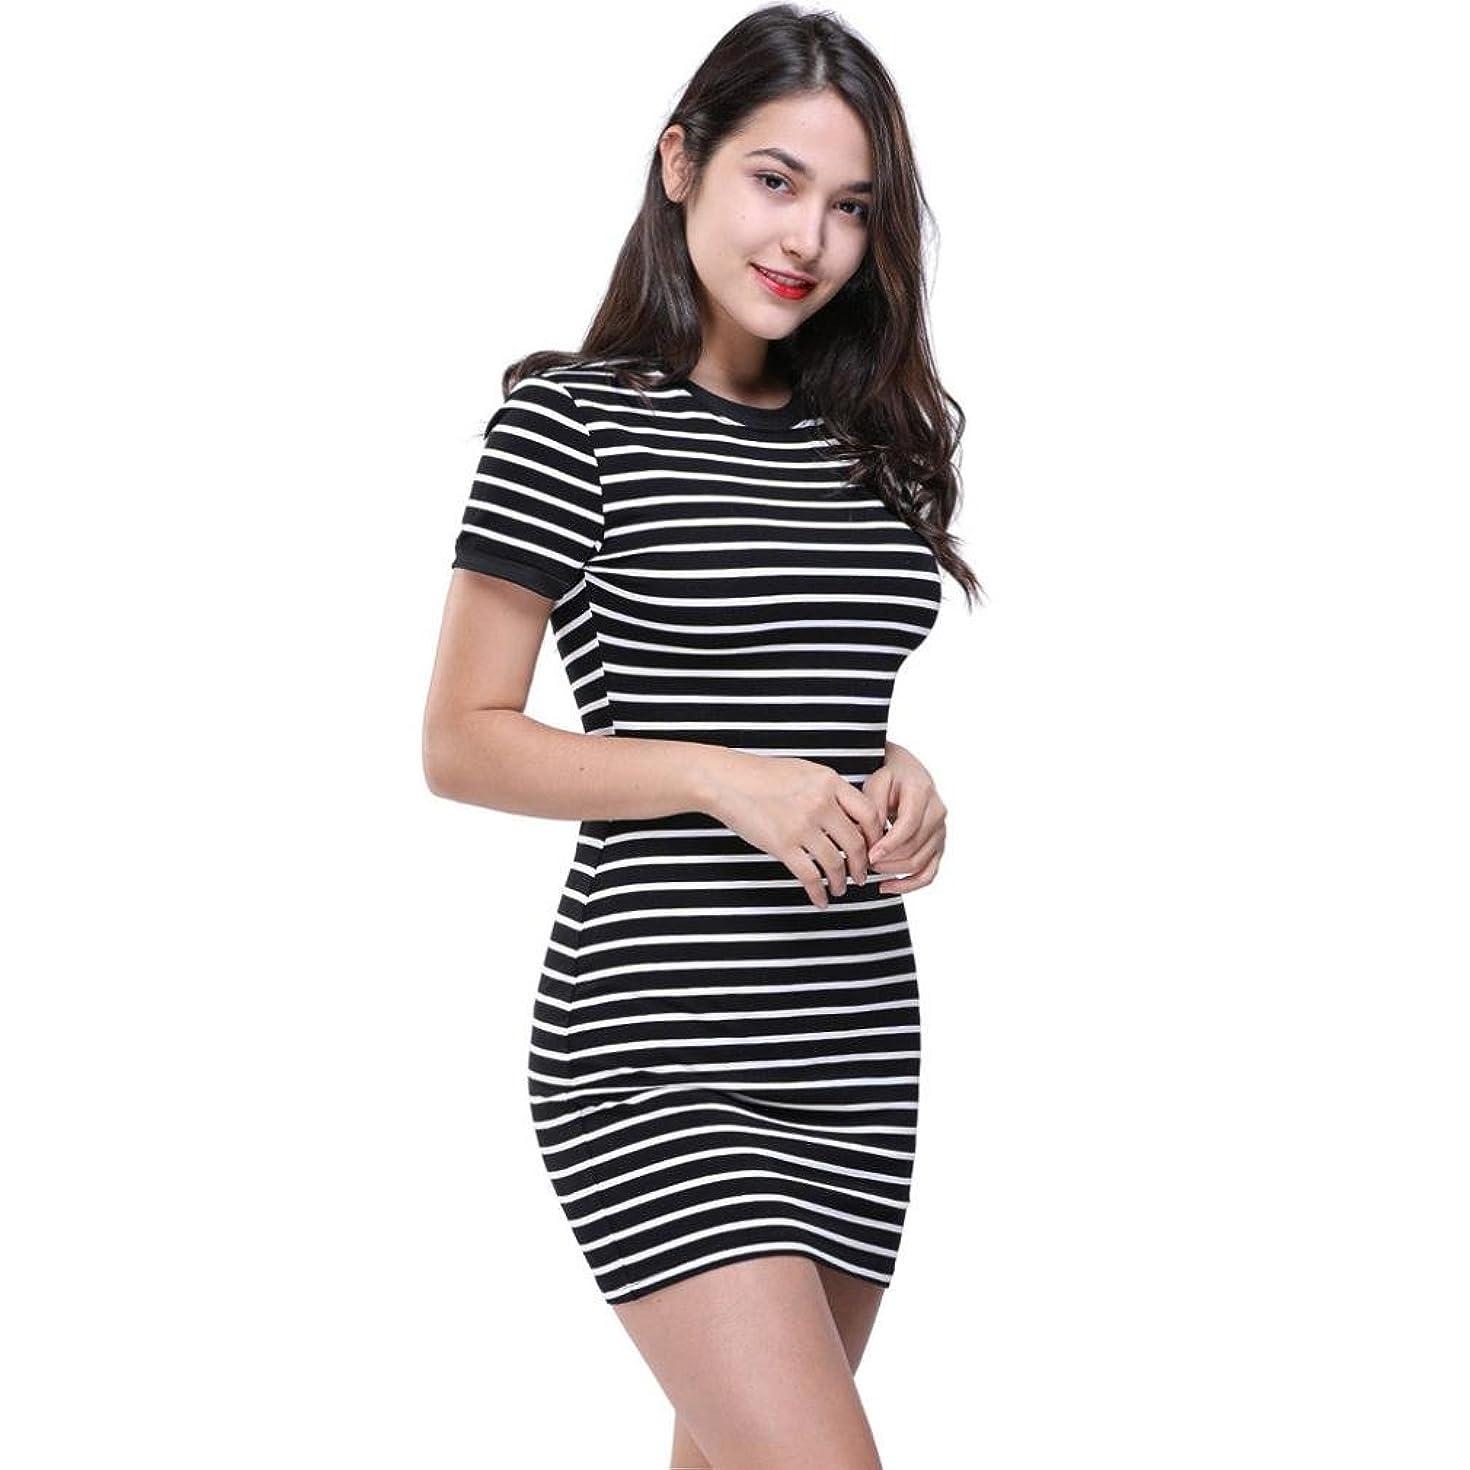 Hemlock Stripe Bodycon Dress Women Juniors Family Party Dress Slim Office Working Dress (L, Black)